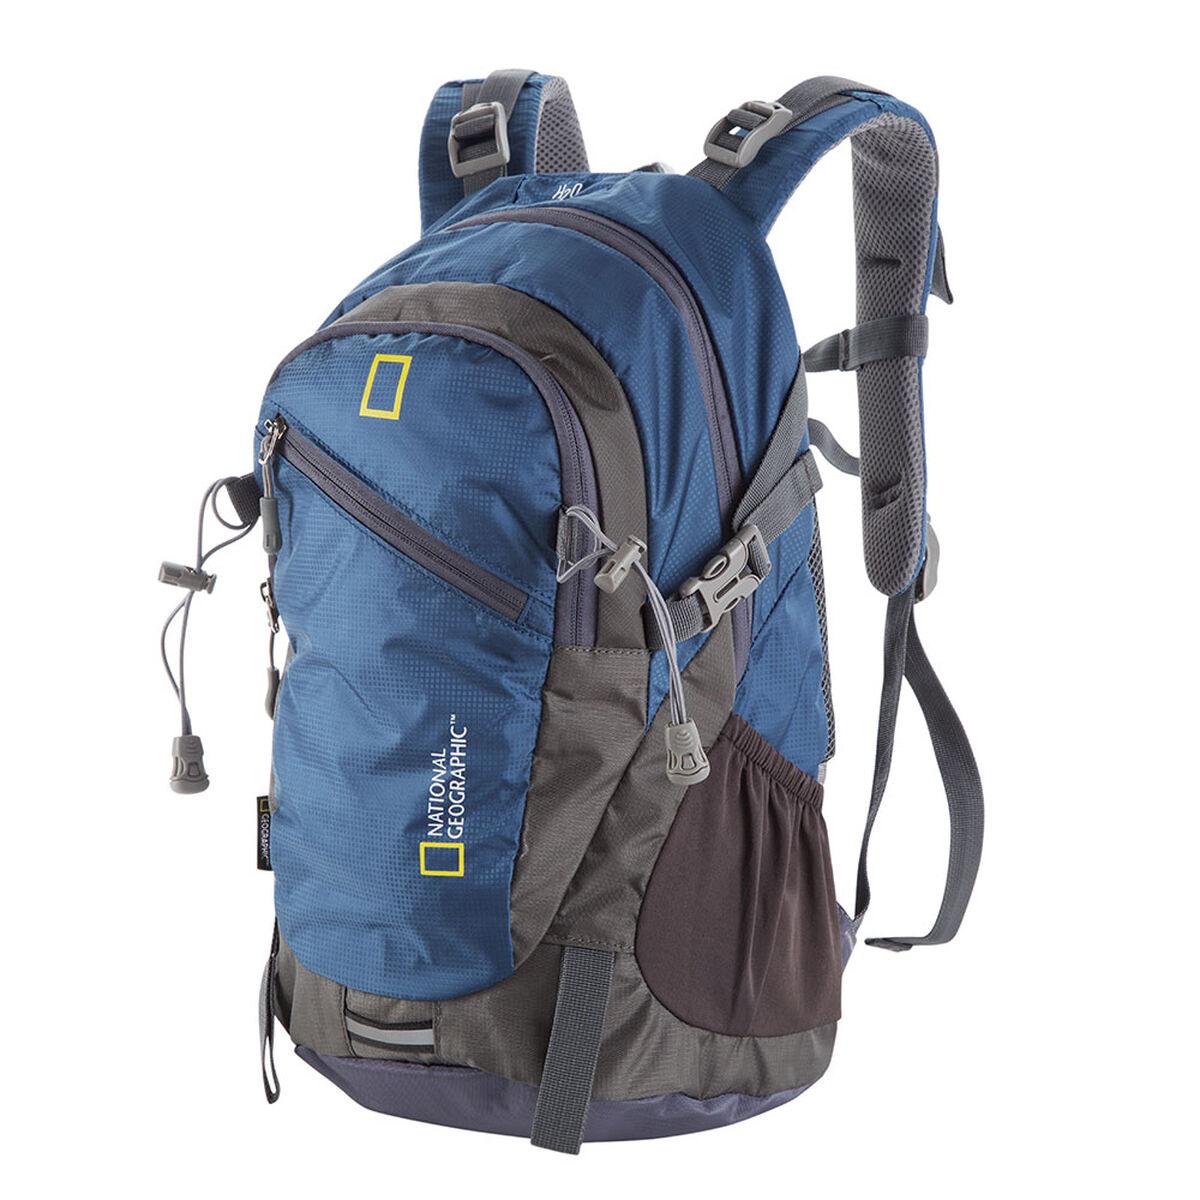 Mochila National Geographic Nepal 20L Azul